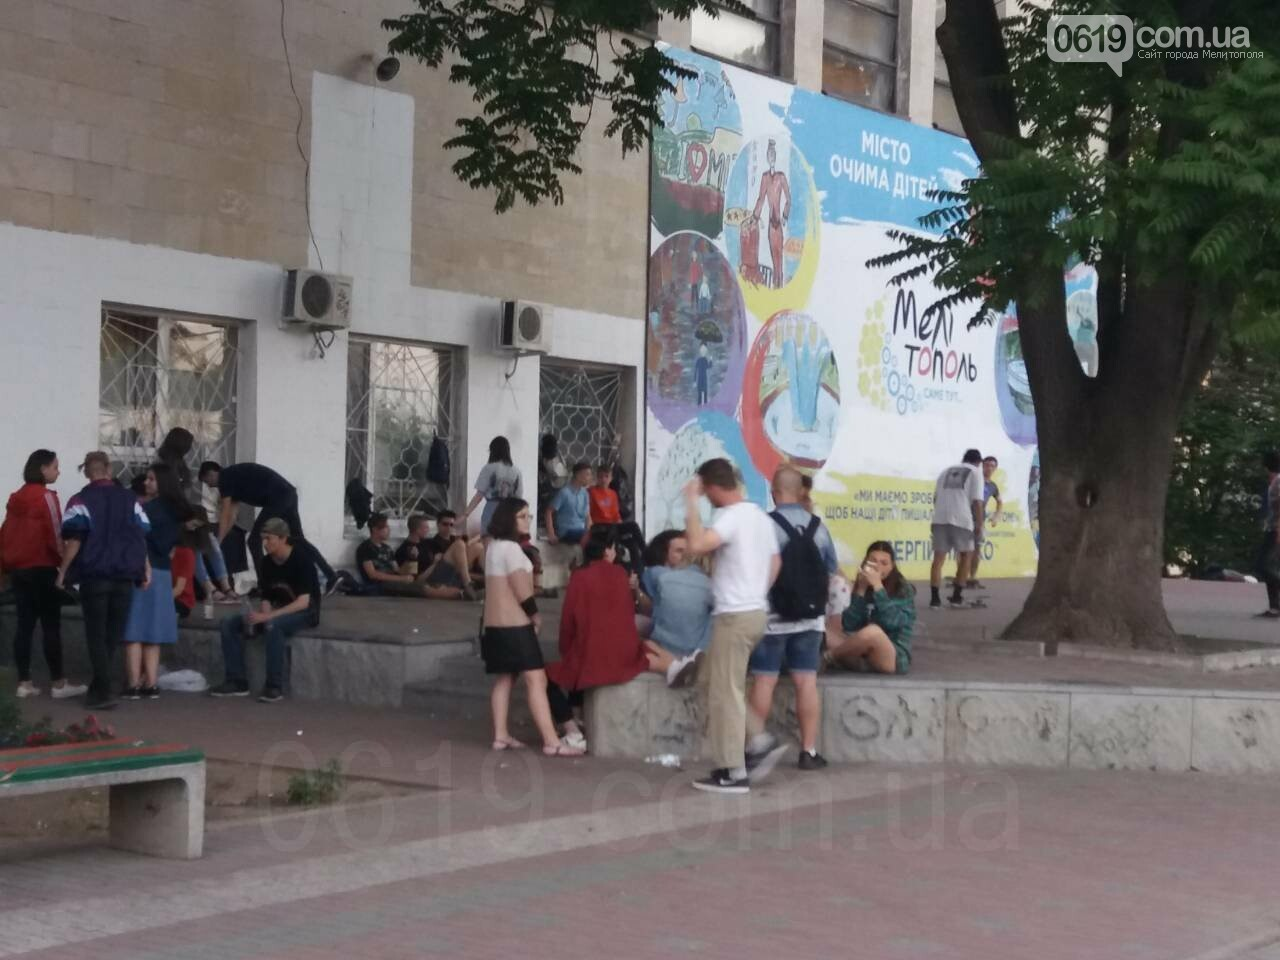 Мелитопольская молодежь превратила центр города в притон, - ФОТО, фото-2, Фото сайта 0619